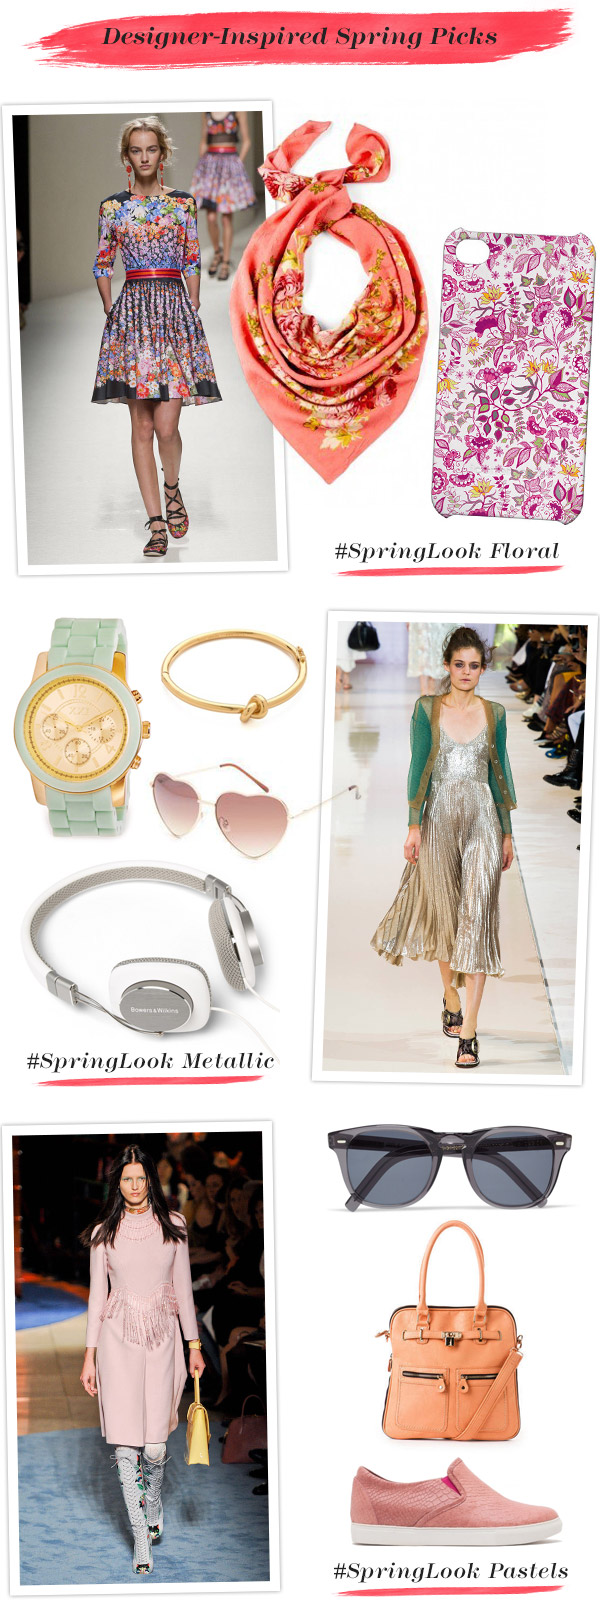 springfashion-trends